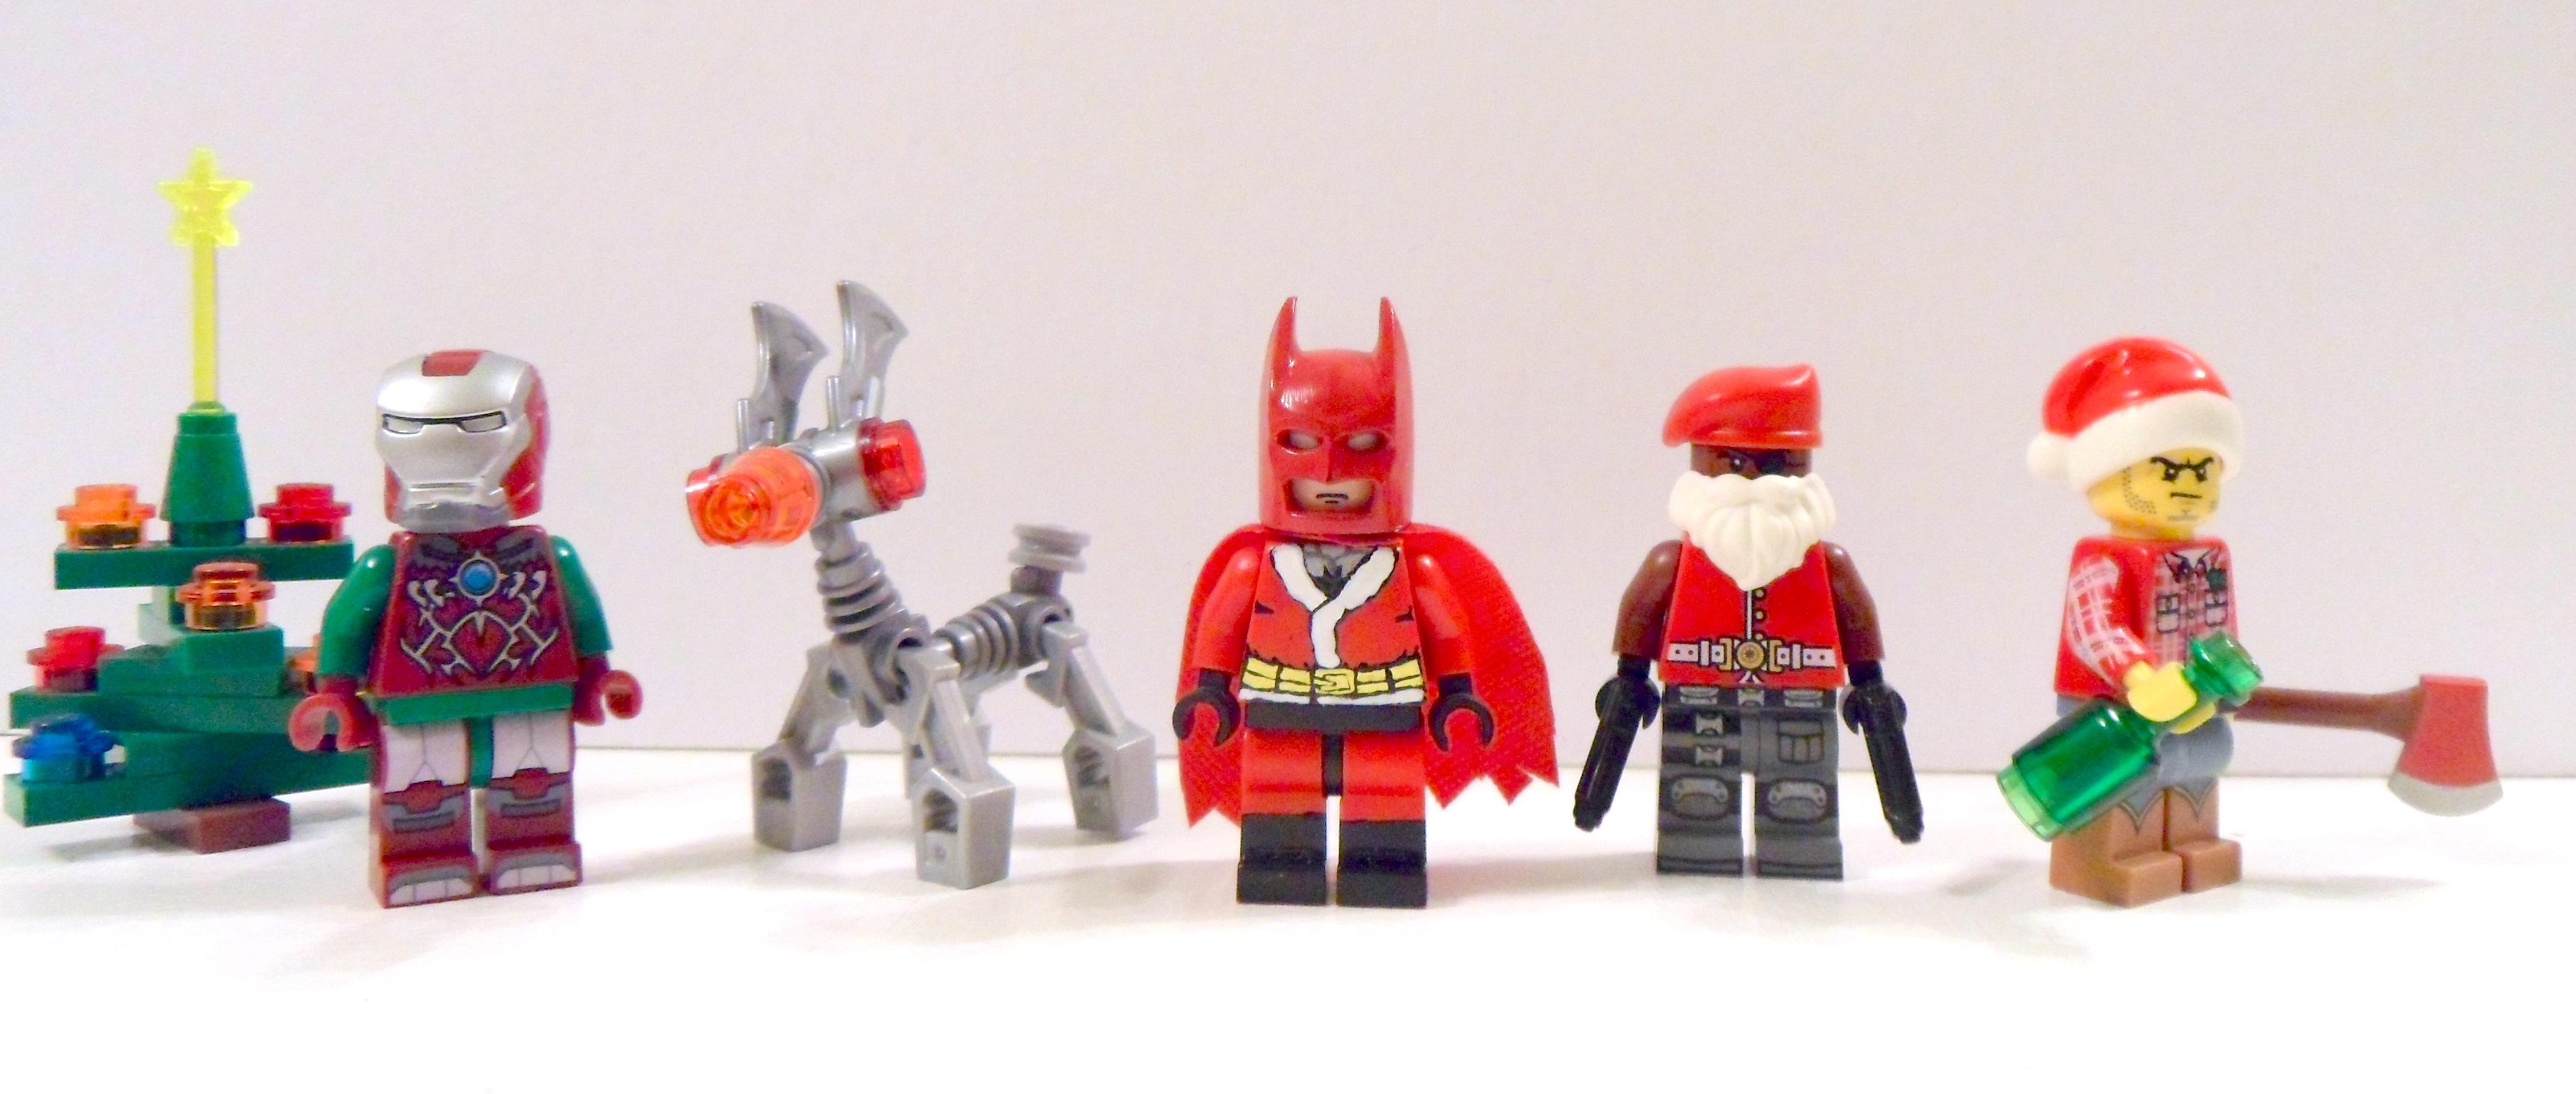 wallpaper : batman, lego, christmas, toy, holiday, dccomics, marvel